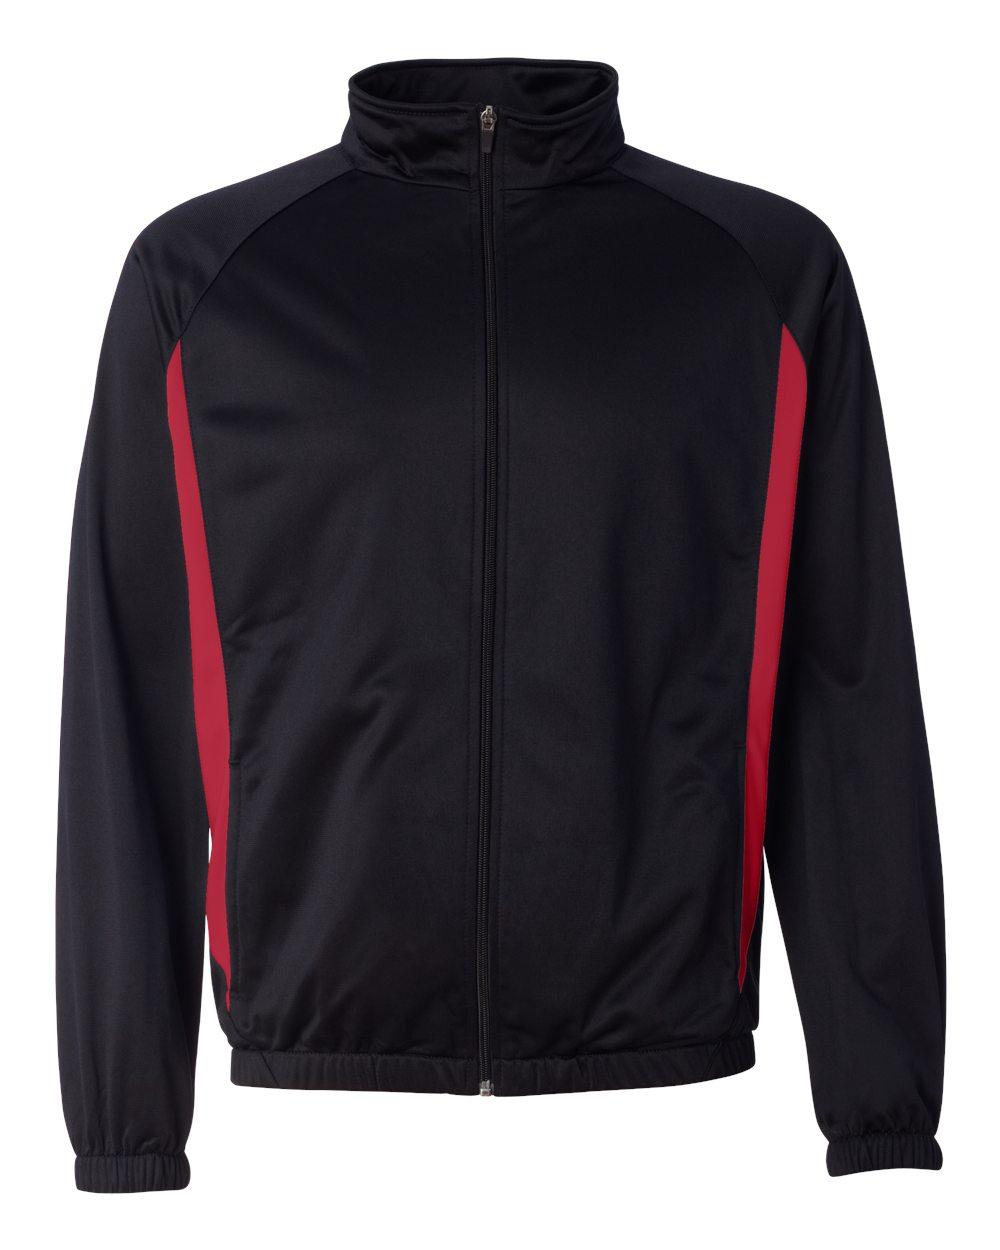 Brushed Tricot Jacket